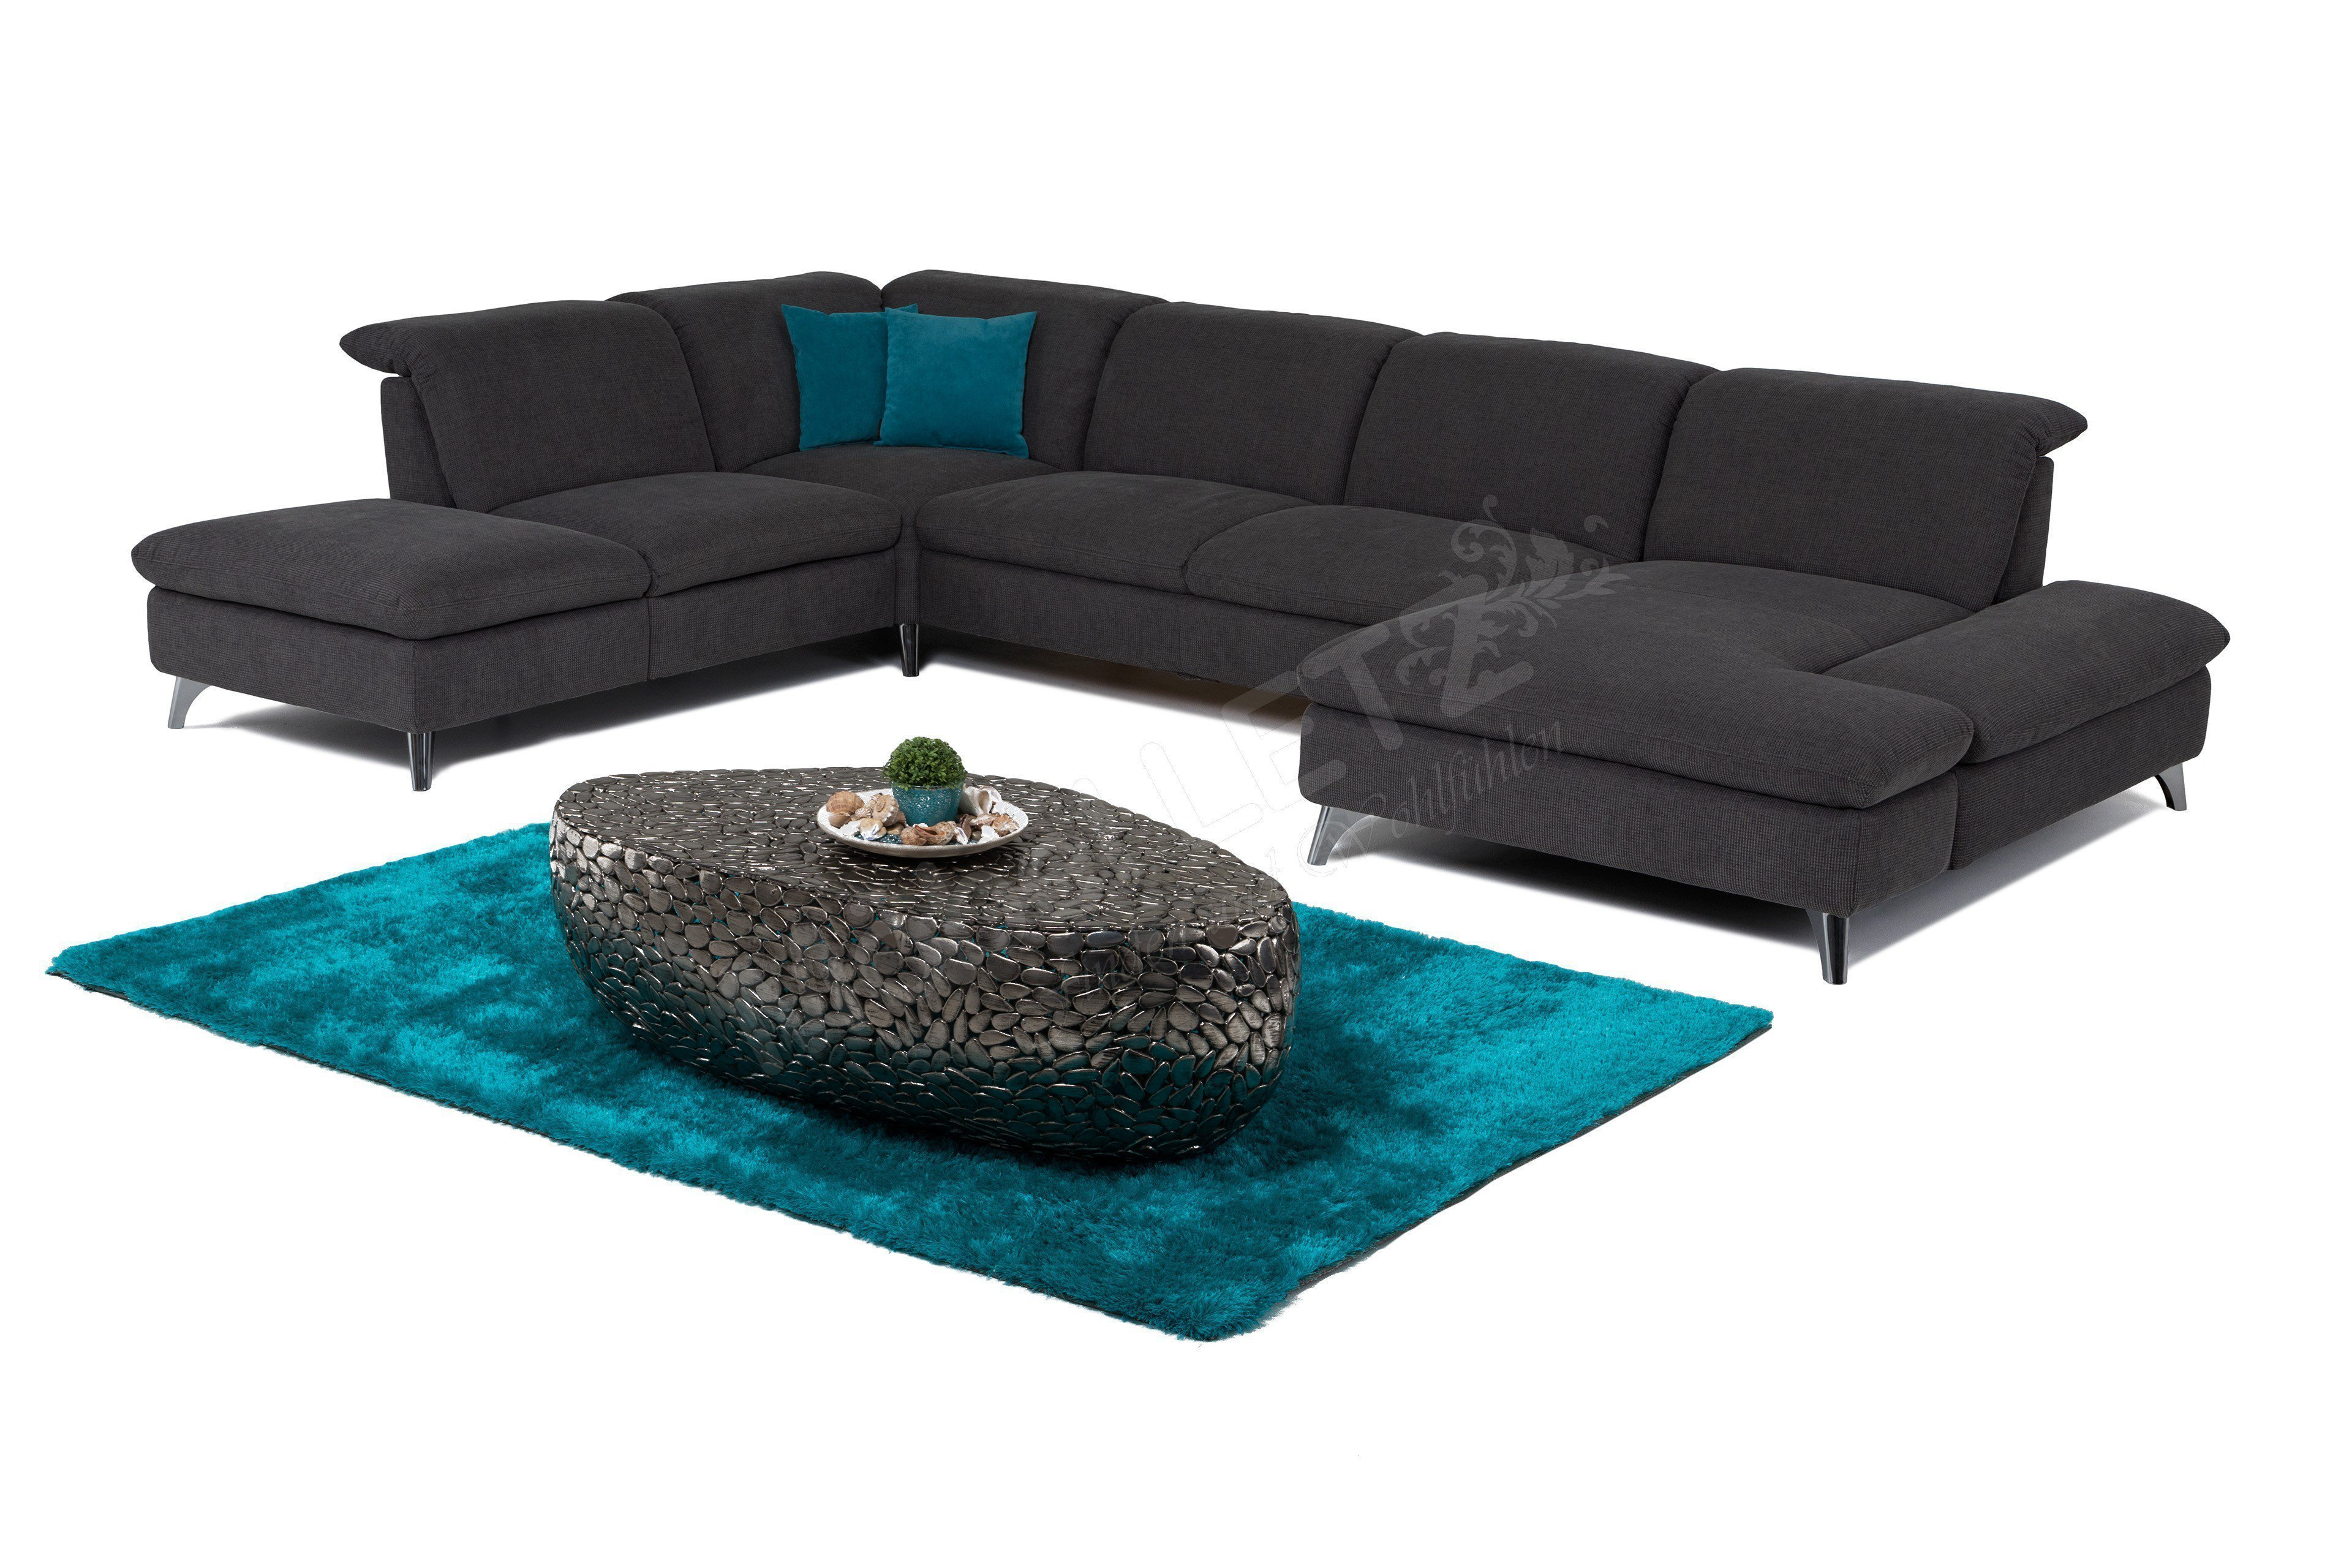 poco polsterm bel detroit wohnlandschaft dunkelgrau m bel letz ihr online shop. Black Bedroom Furniture Sets. Home Design Ideas